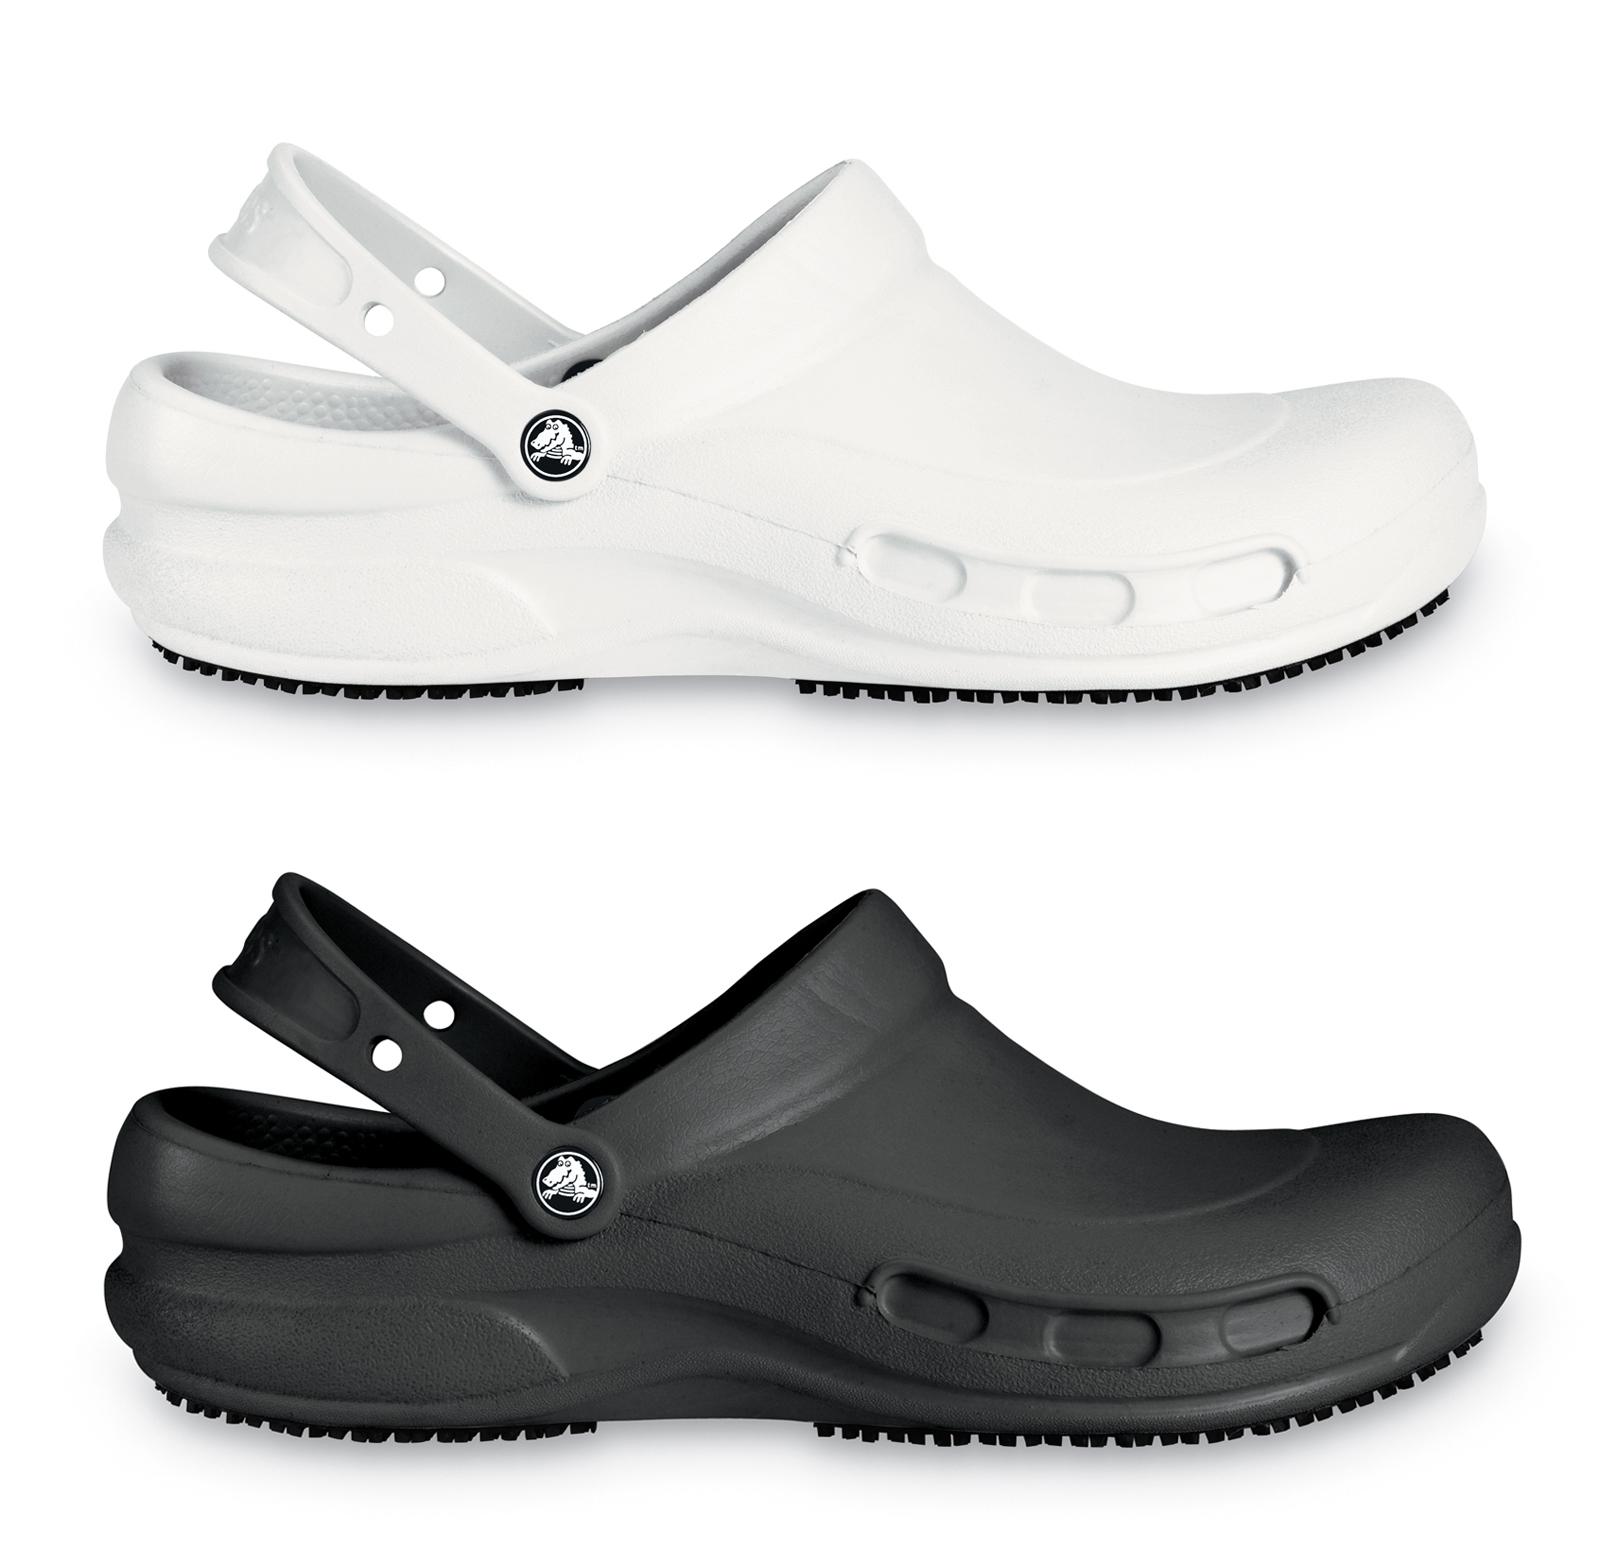 crocs bistro comfort clogs work slip resistant genuine